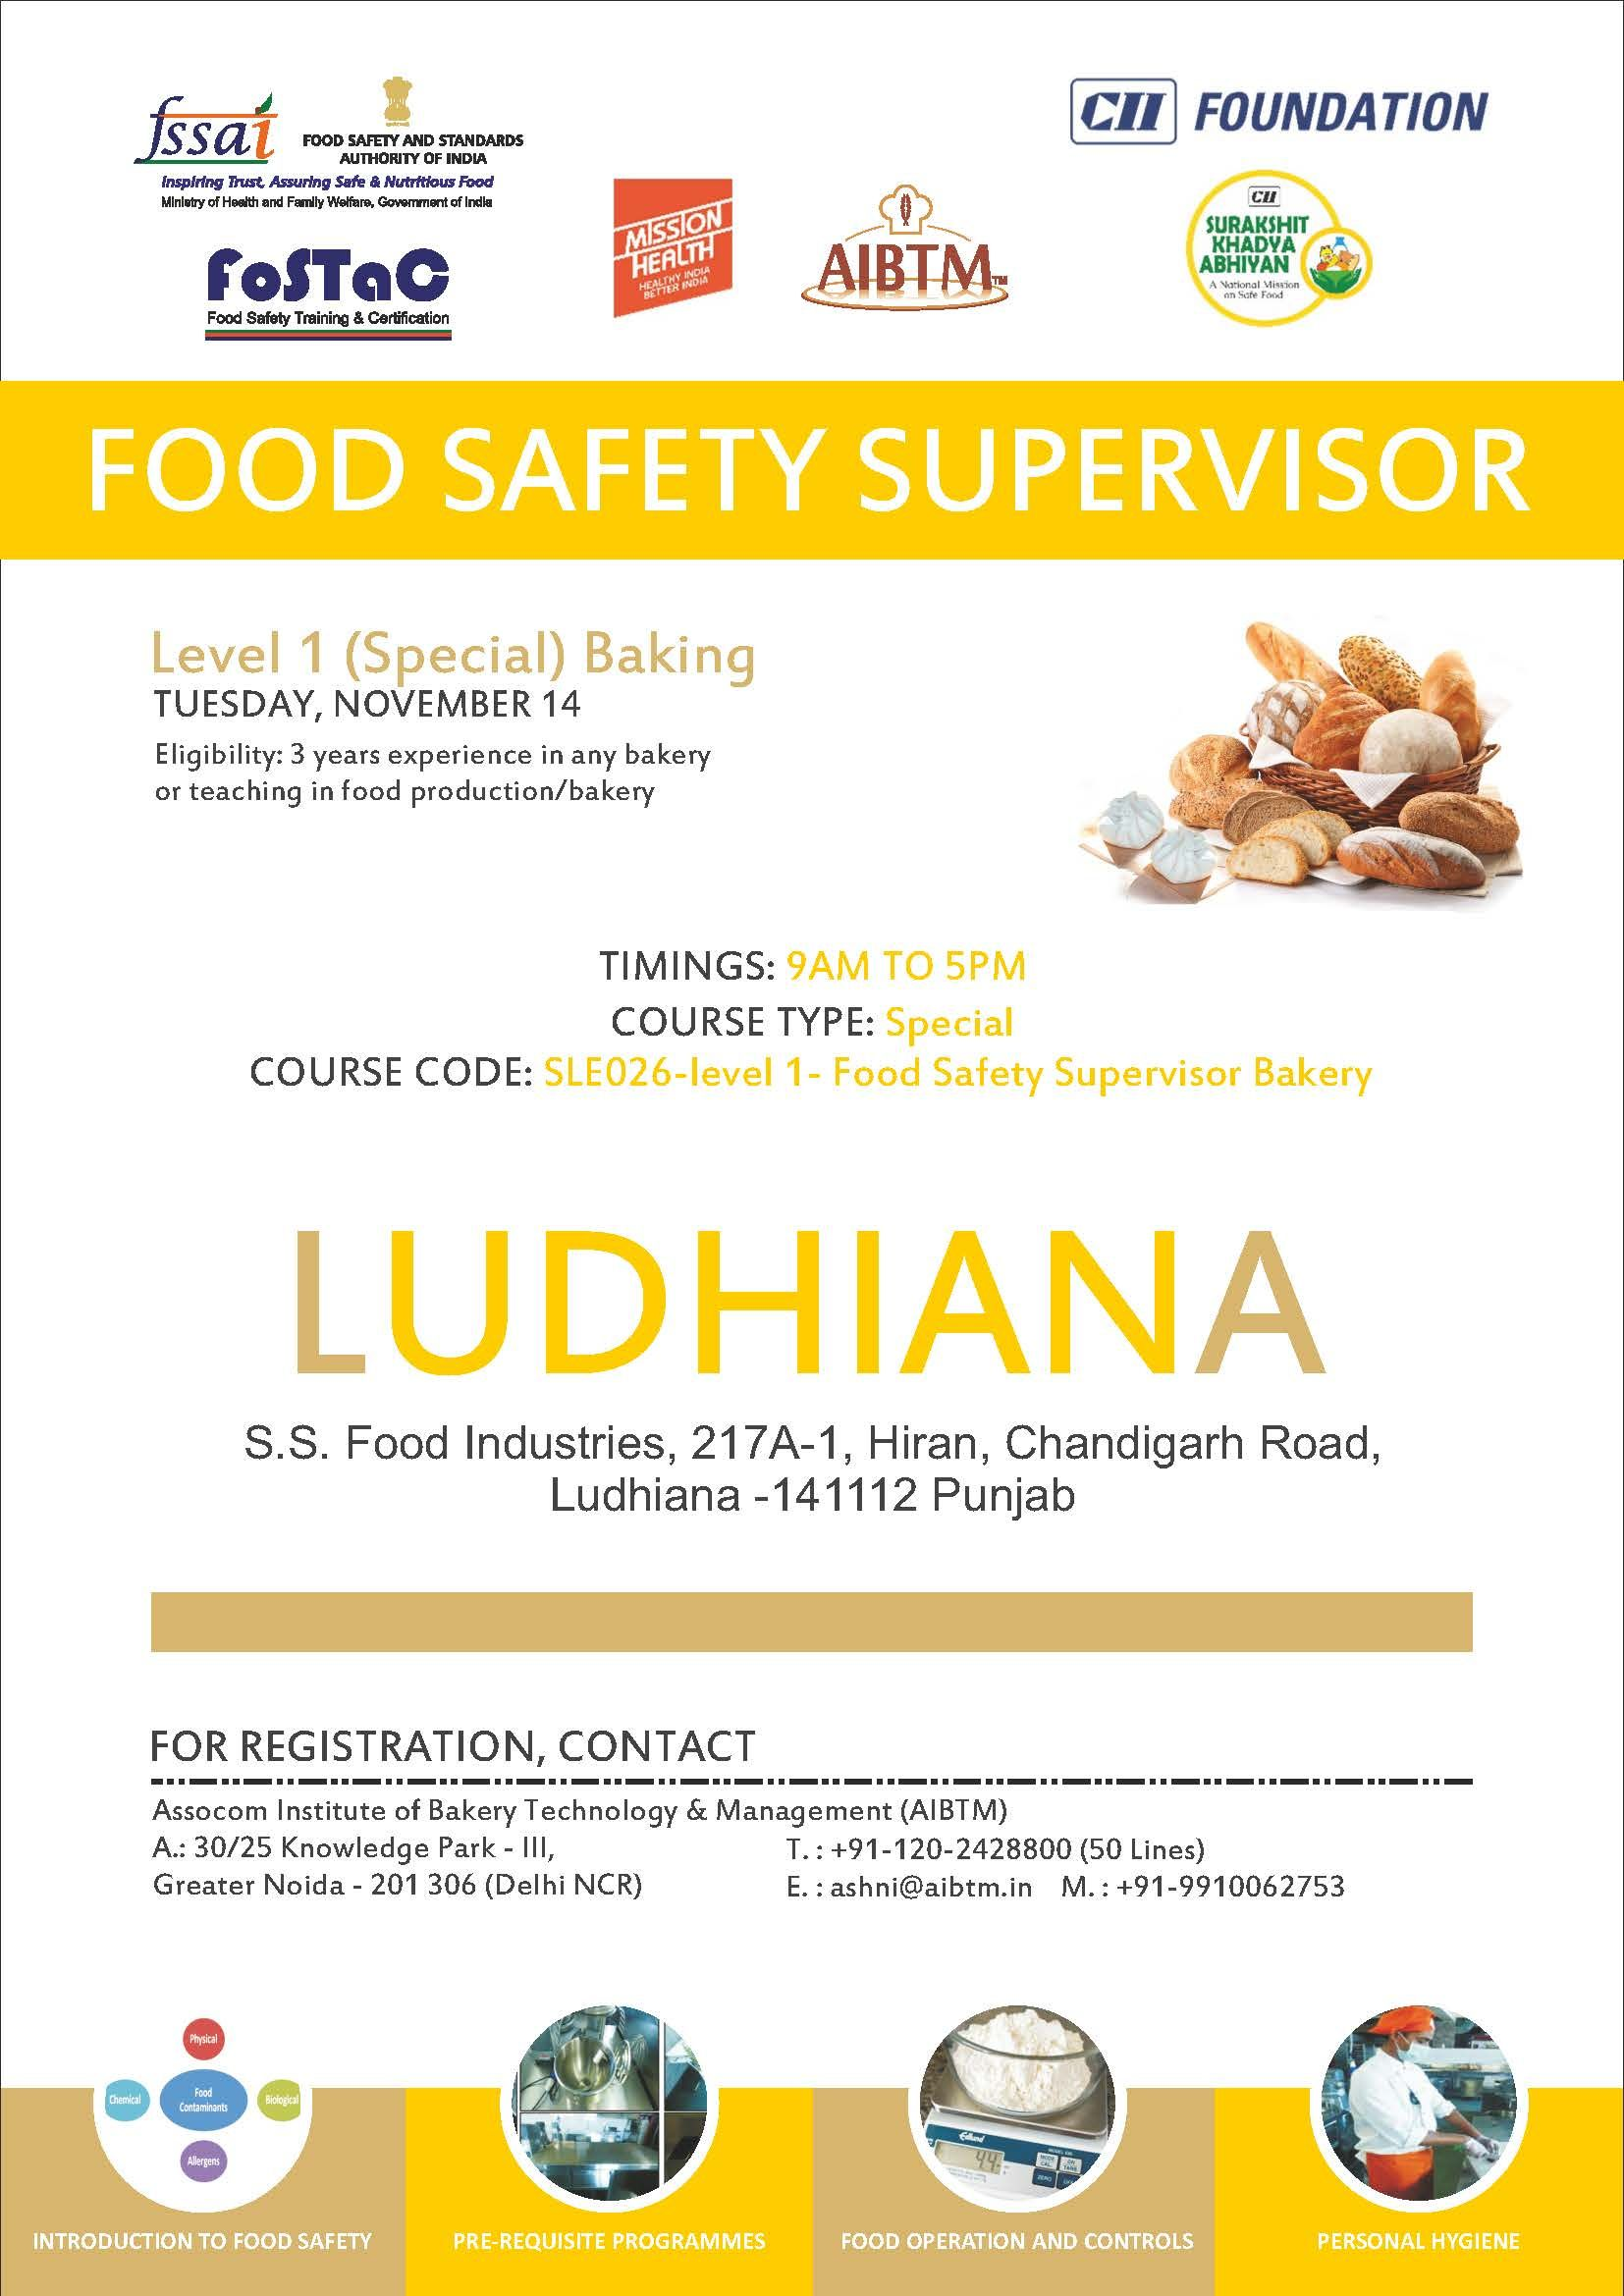 Enroll Food Safety Supervisor Training Program on Level 1